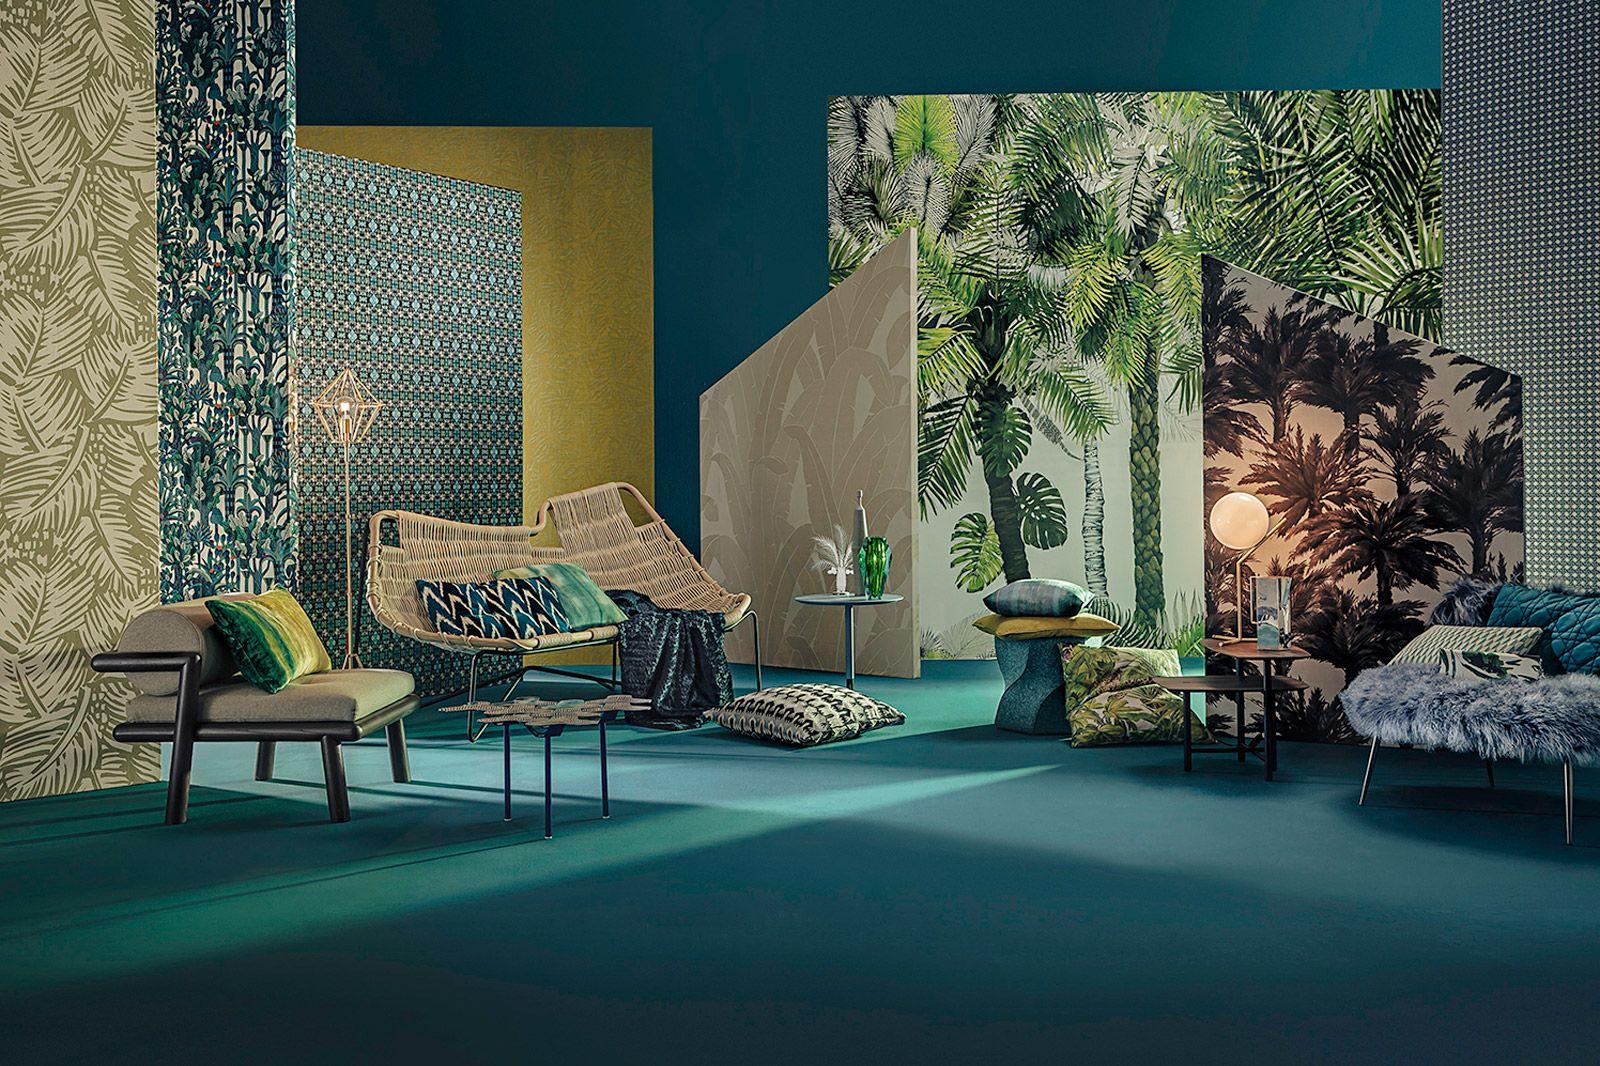 Card Games Furniture Store Design Famous Interiors Flooring